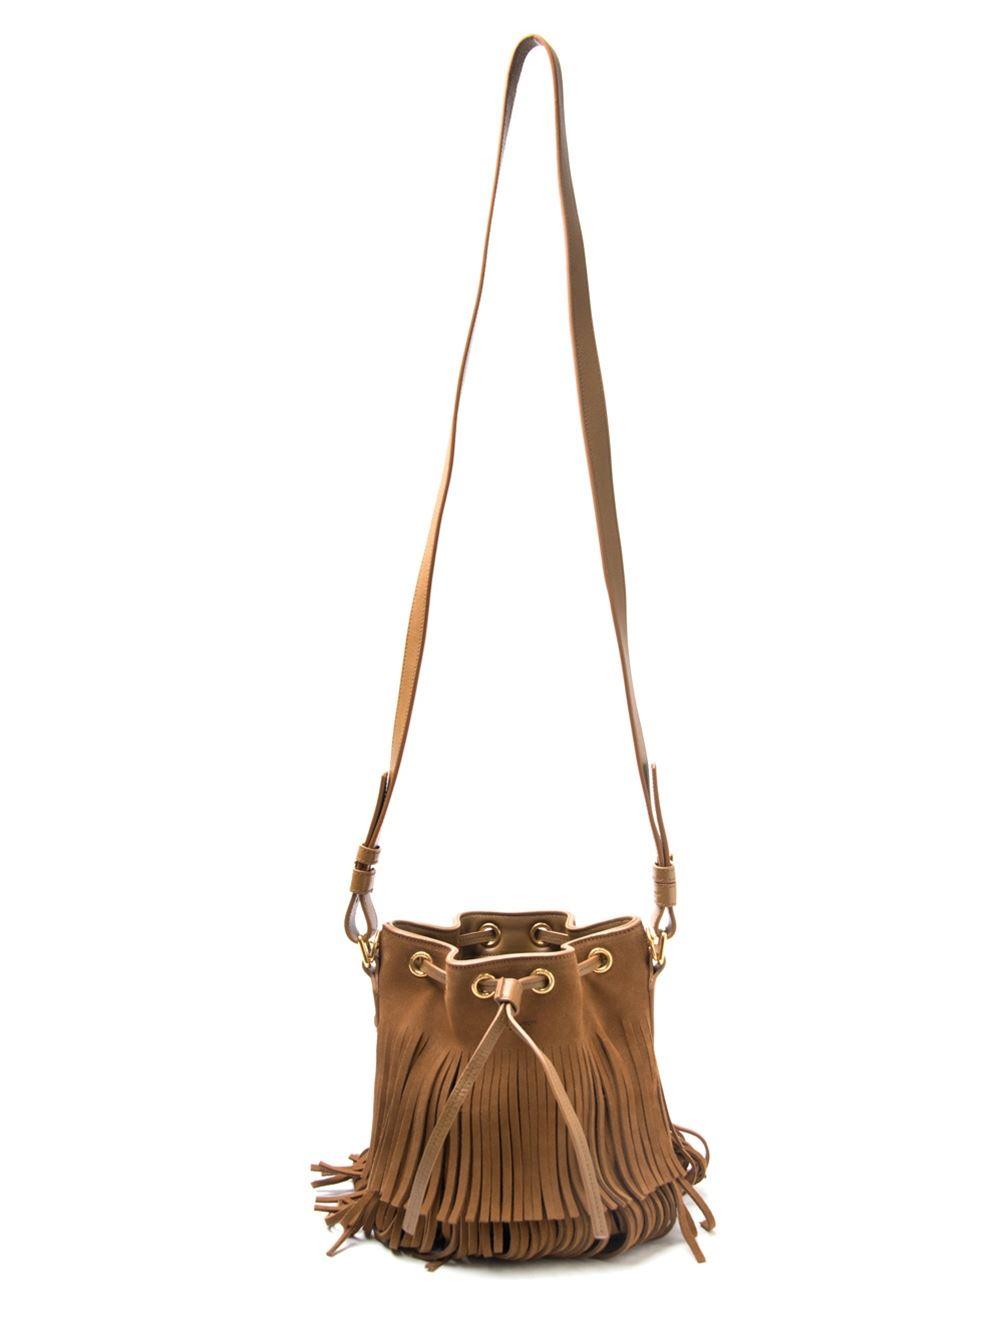 Emmanuelle Small Suede Fringe Bucket Bag, Dark Brown